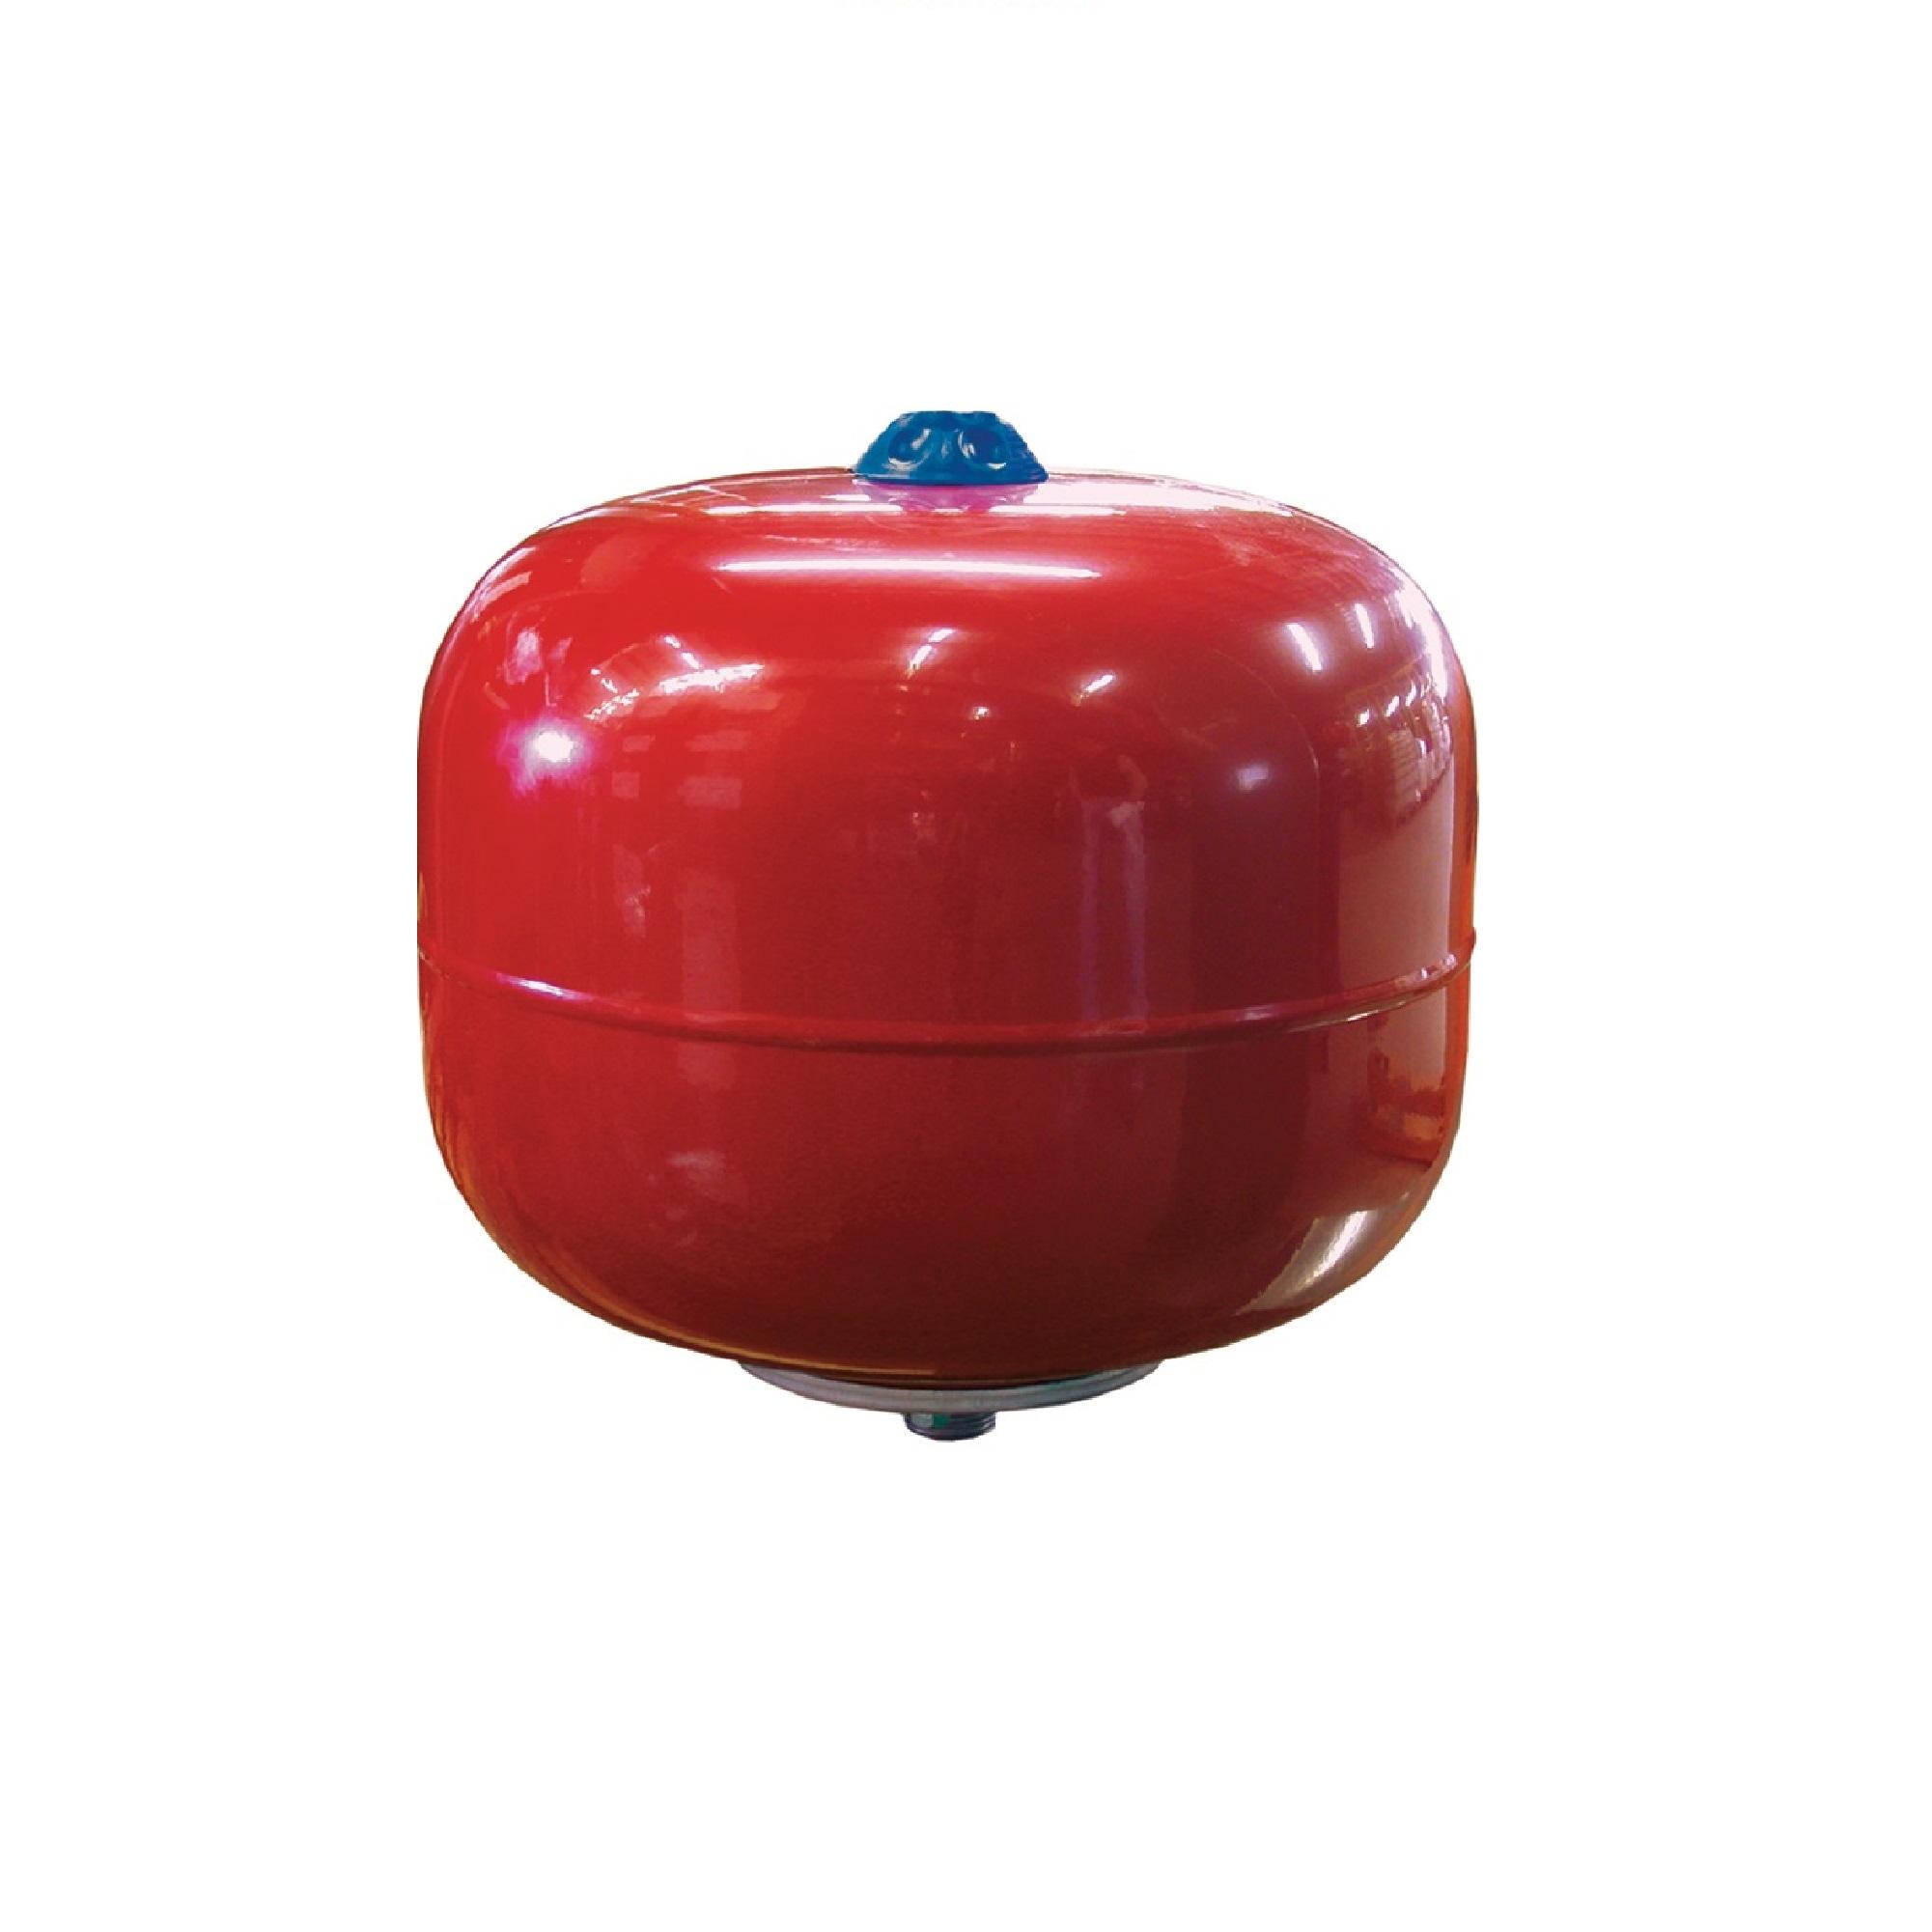 Idrosfera vaso di espansione per autoclave 24 l varem for Vasi di espansione a membrana